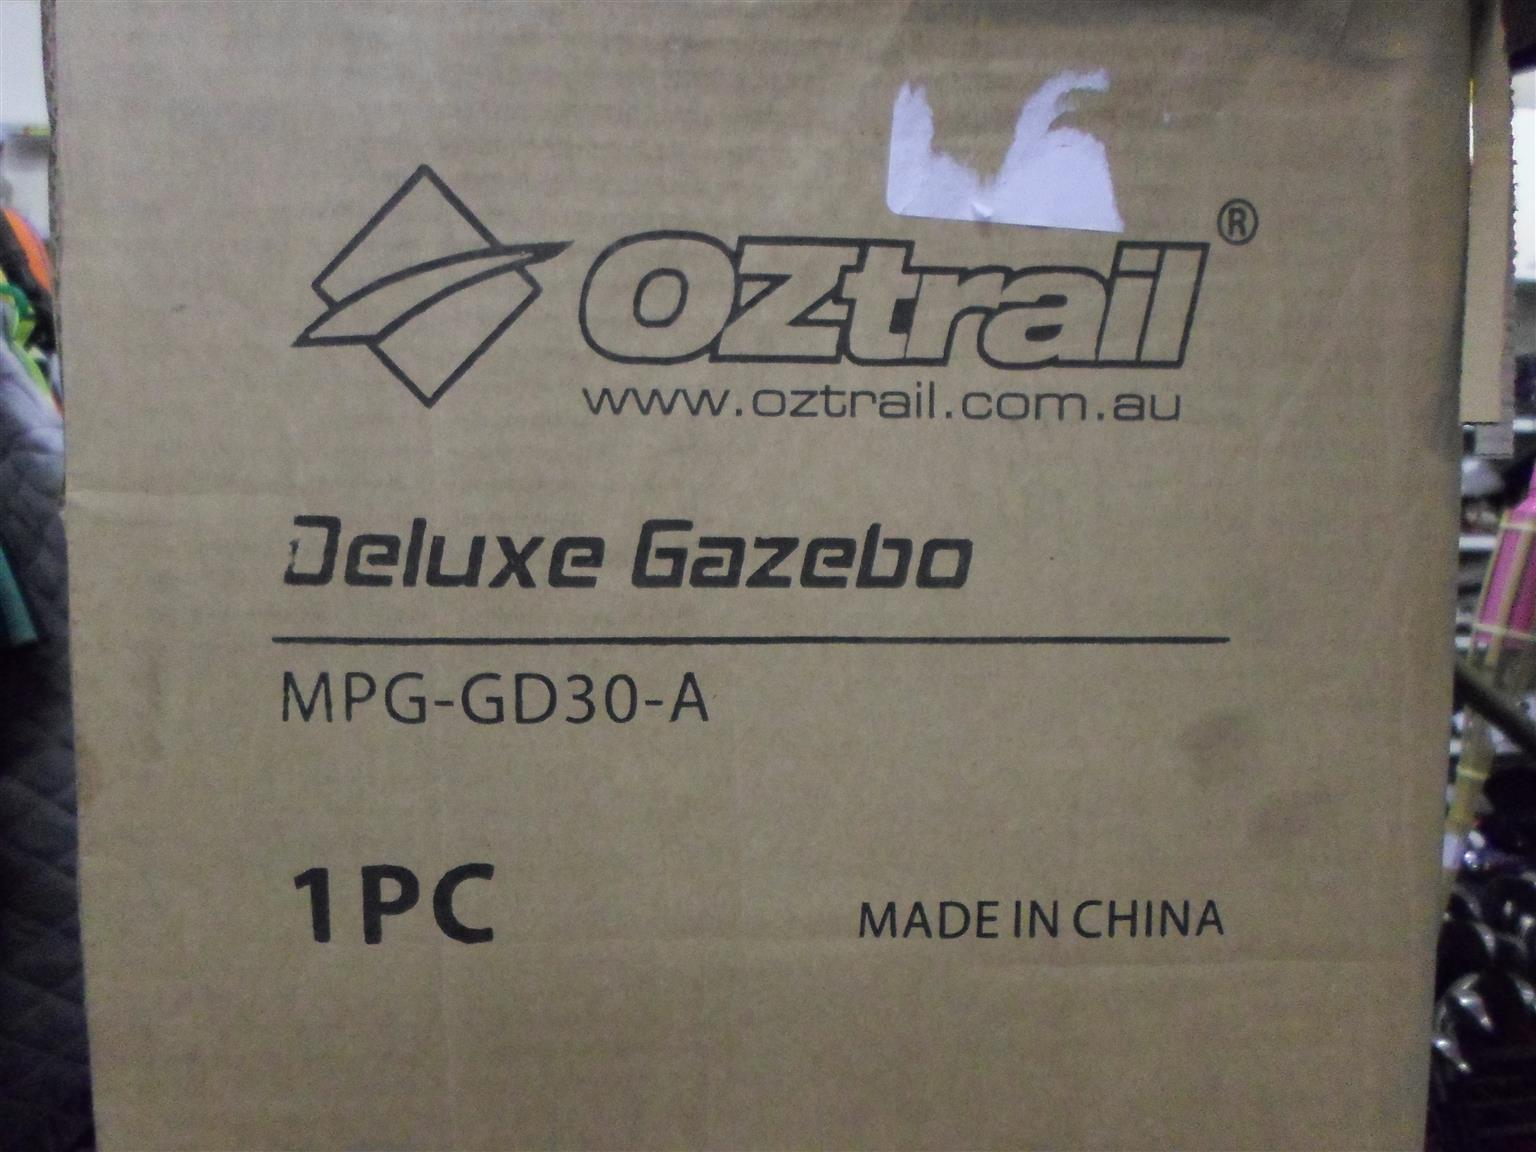 3x3m OZtrail Deluxe Gazebo